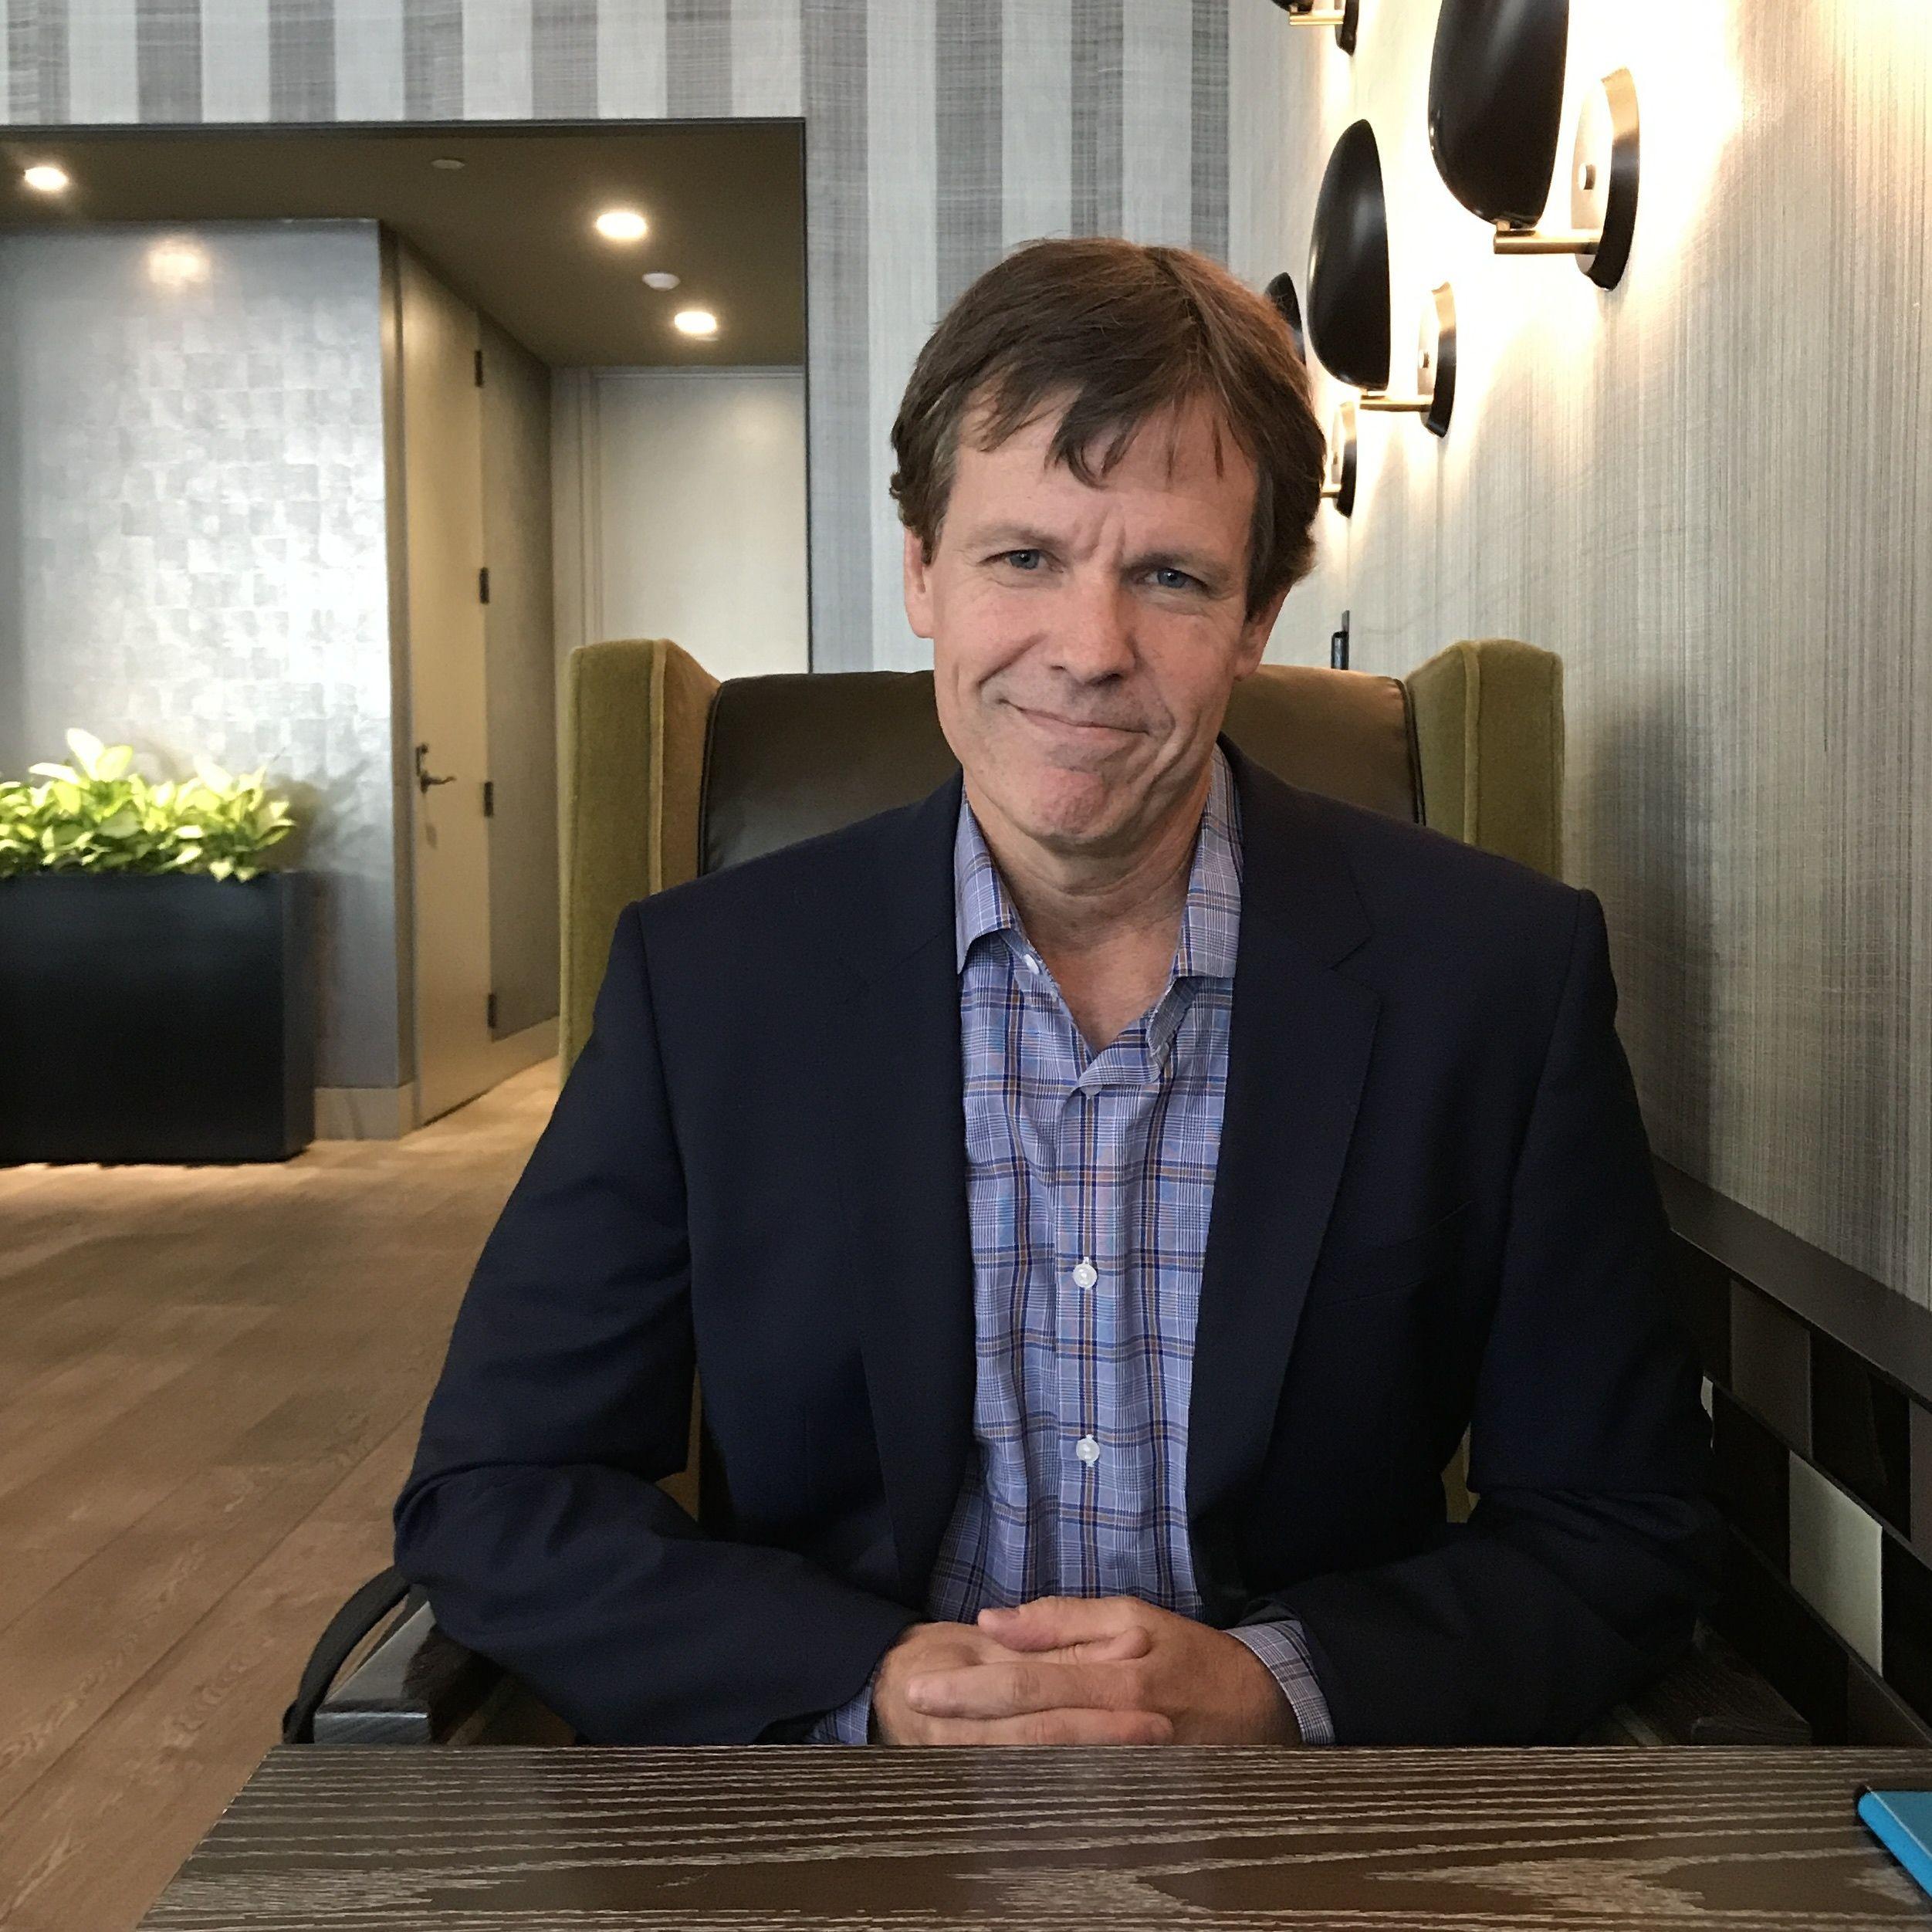 Michael harris mayoral candidate nikqth